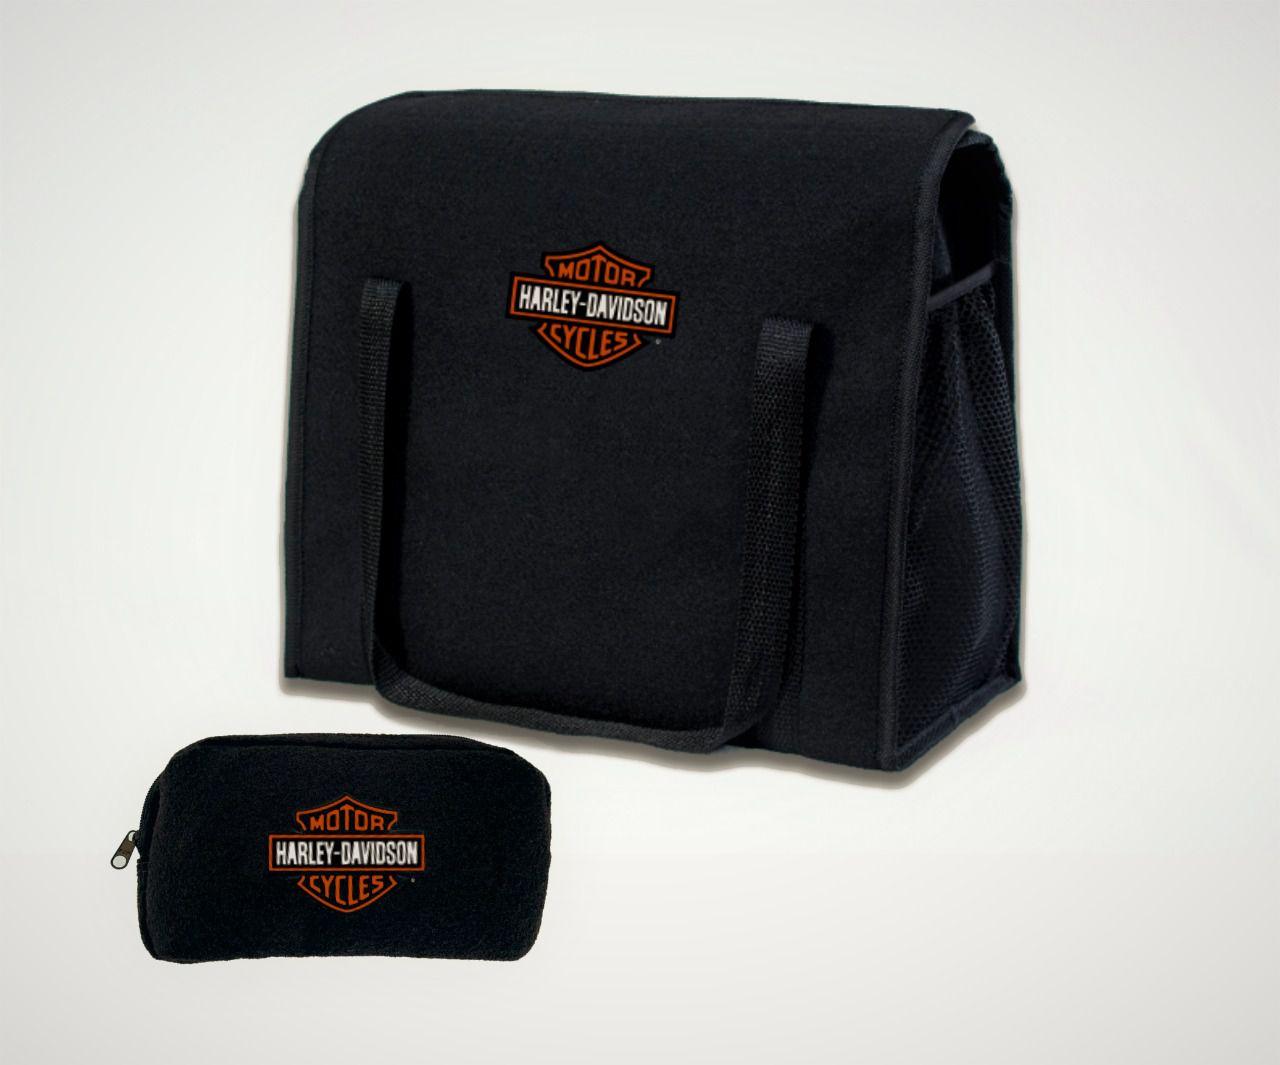 Kit Bolsa Organizadora Porta Malas e Necessaire Porta Luvas Harley-Davidson